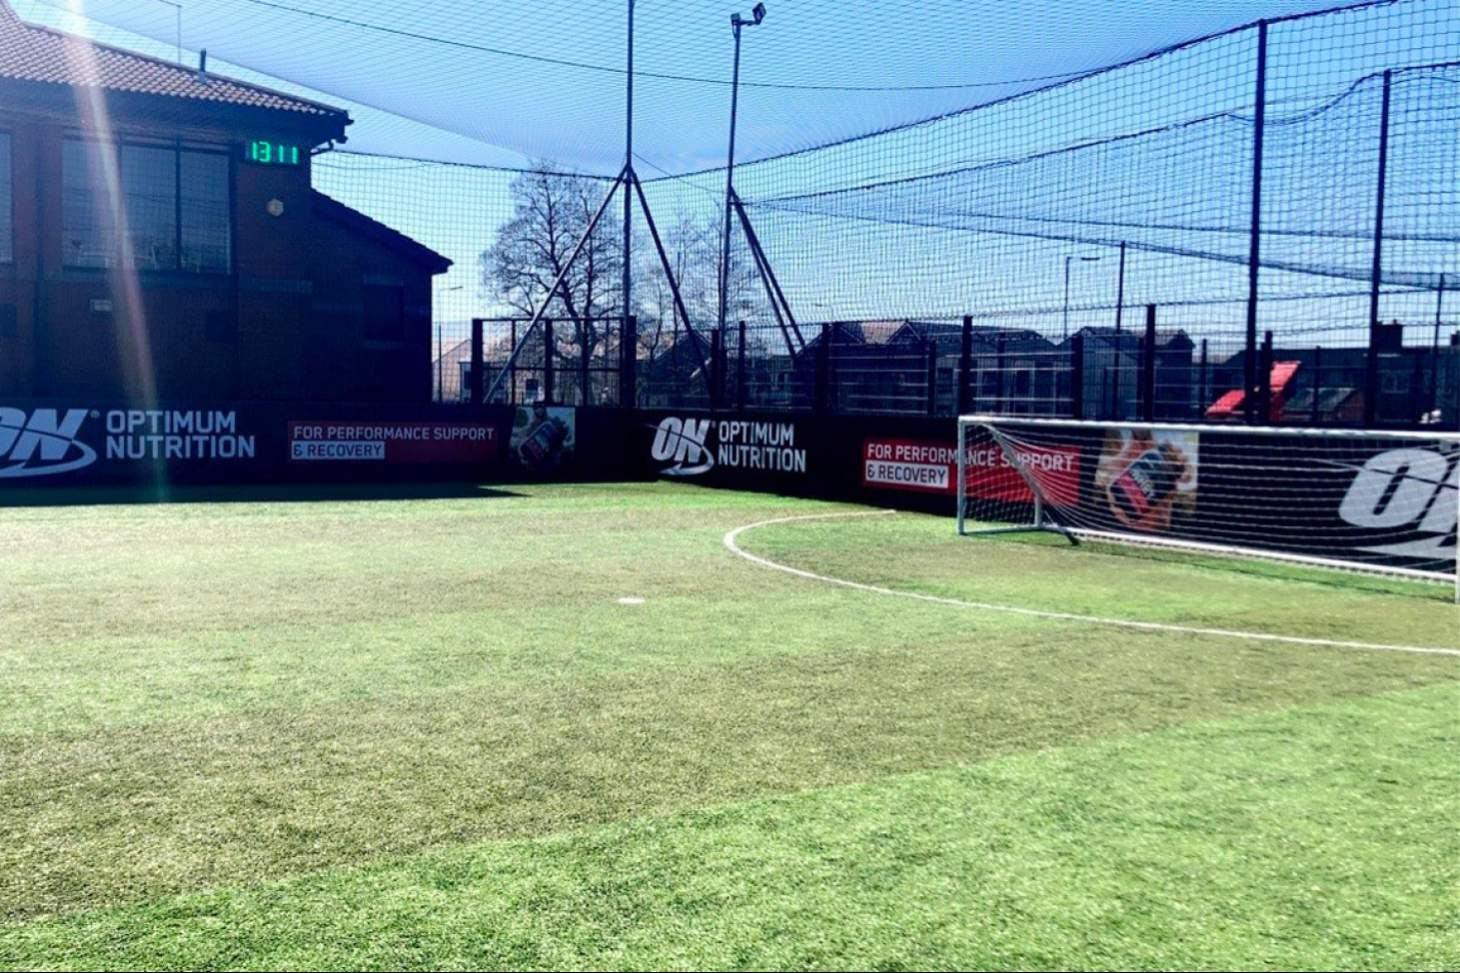 Powerleague Liverpool 5 a side | 3G Astroturf football pitch